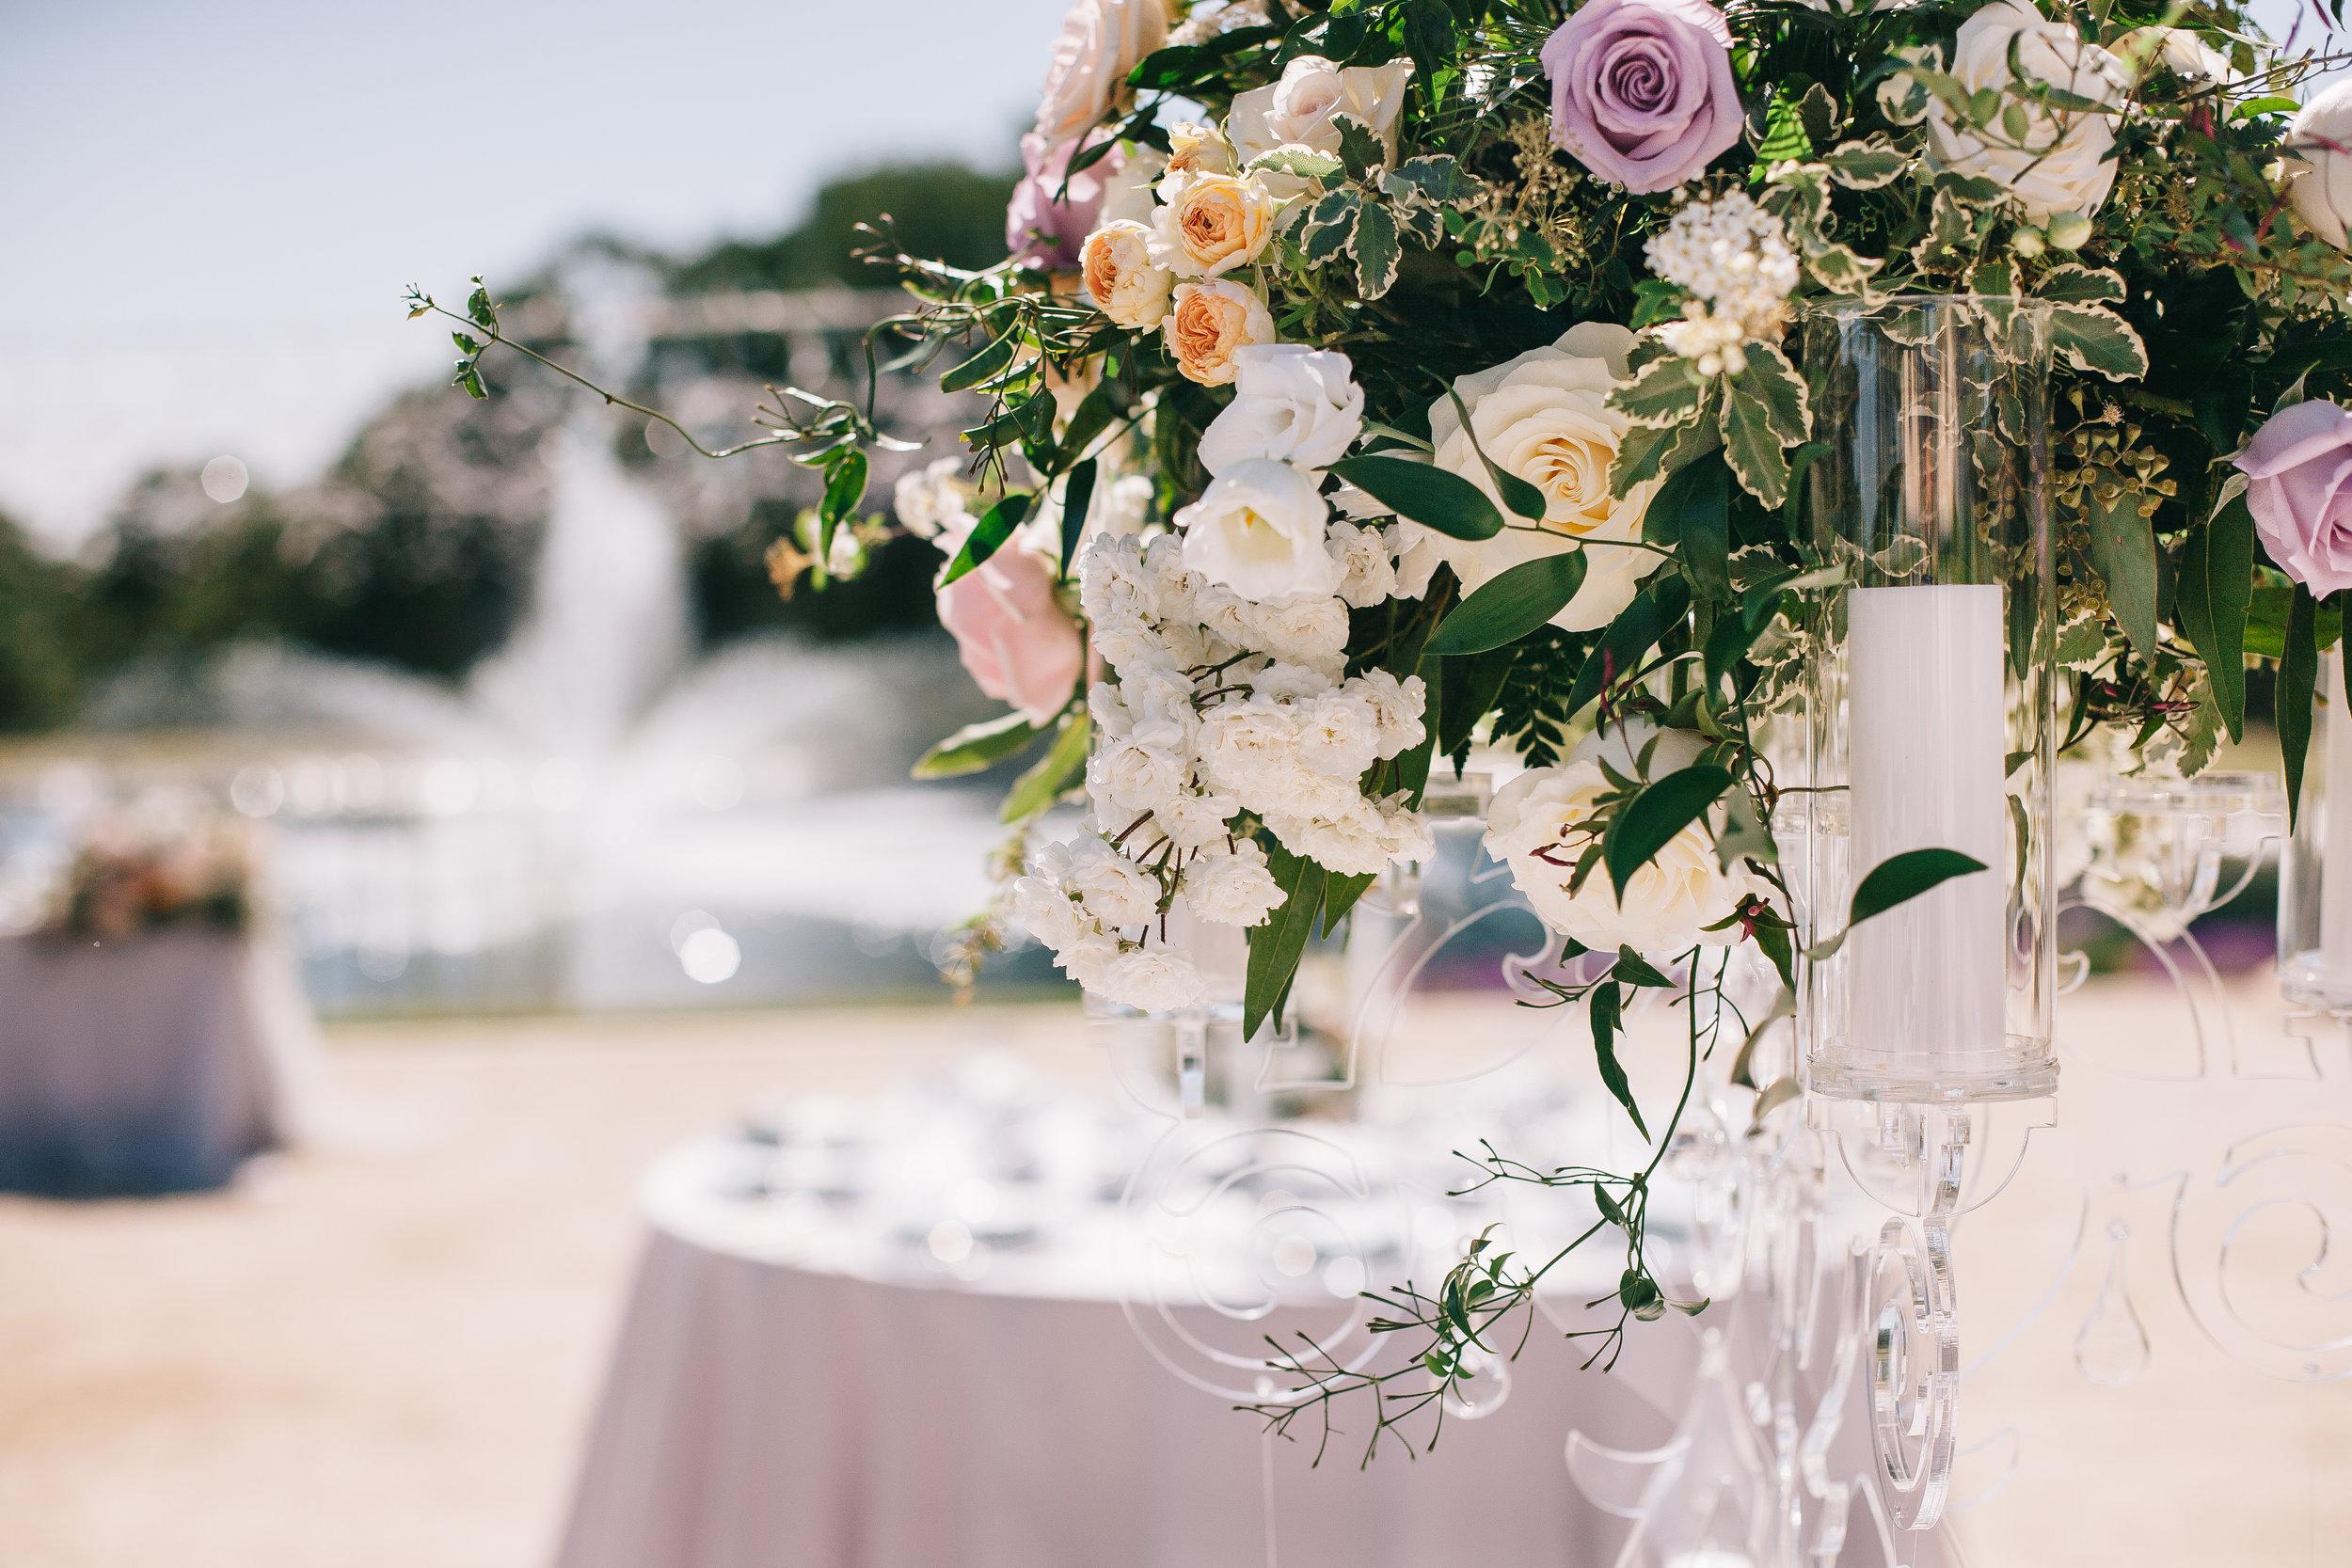 Violette-fleurs-event-design-roseville-anna-perevertaylo-rancho-robles-vinyards-Detail-Installations-Design-Bride-groom-Wedding-design.jpg